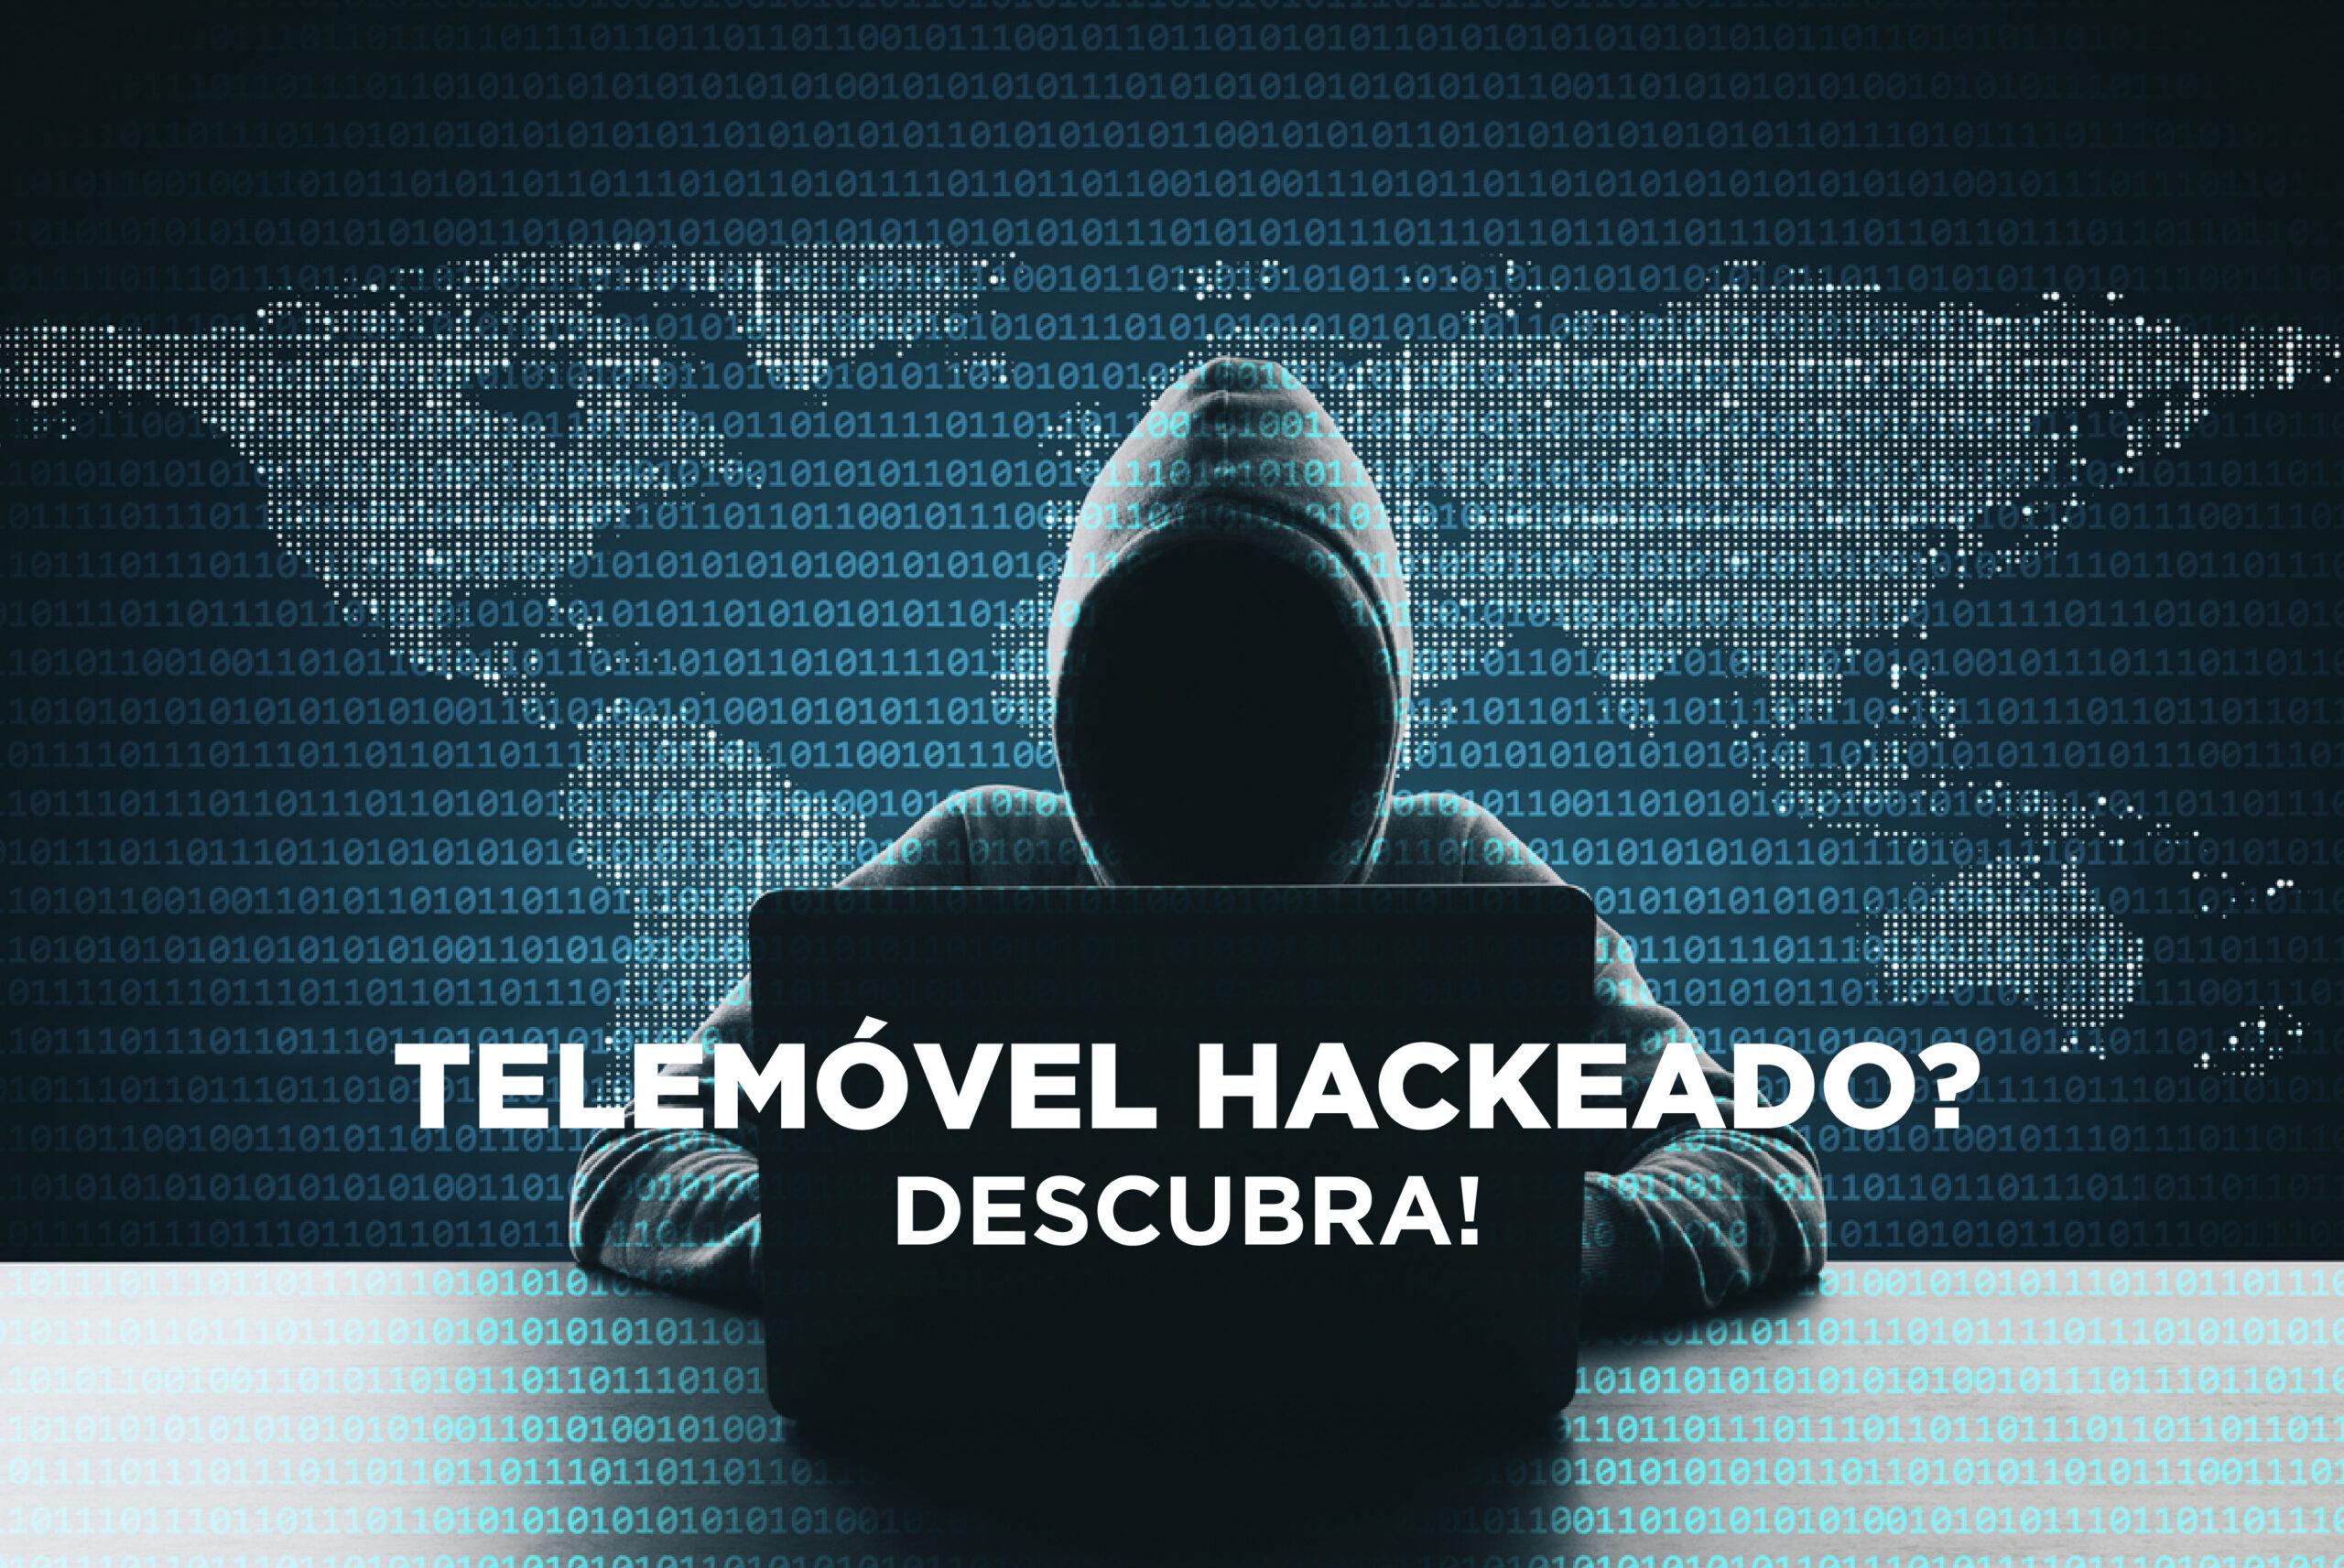 Desconfia que o seu telemóvel foi hackeado? Como saber e resolver!